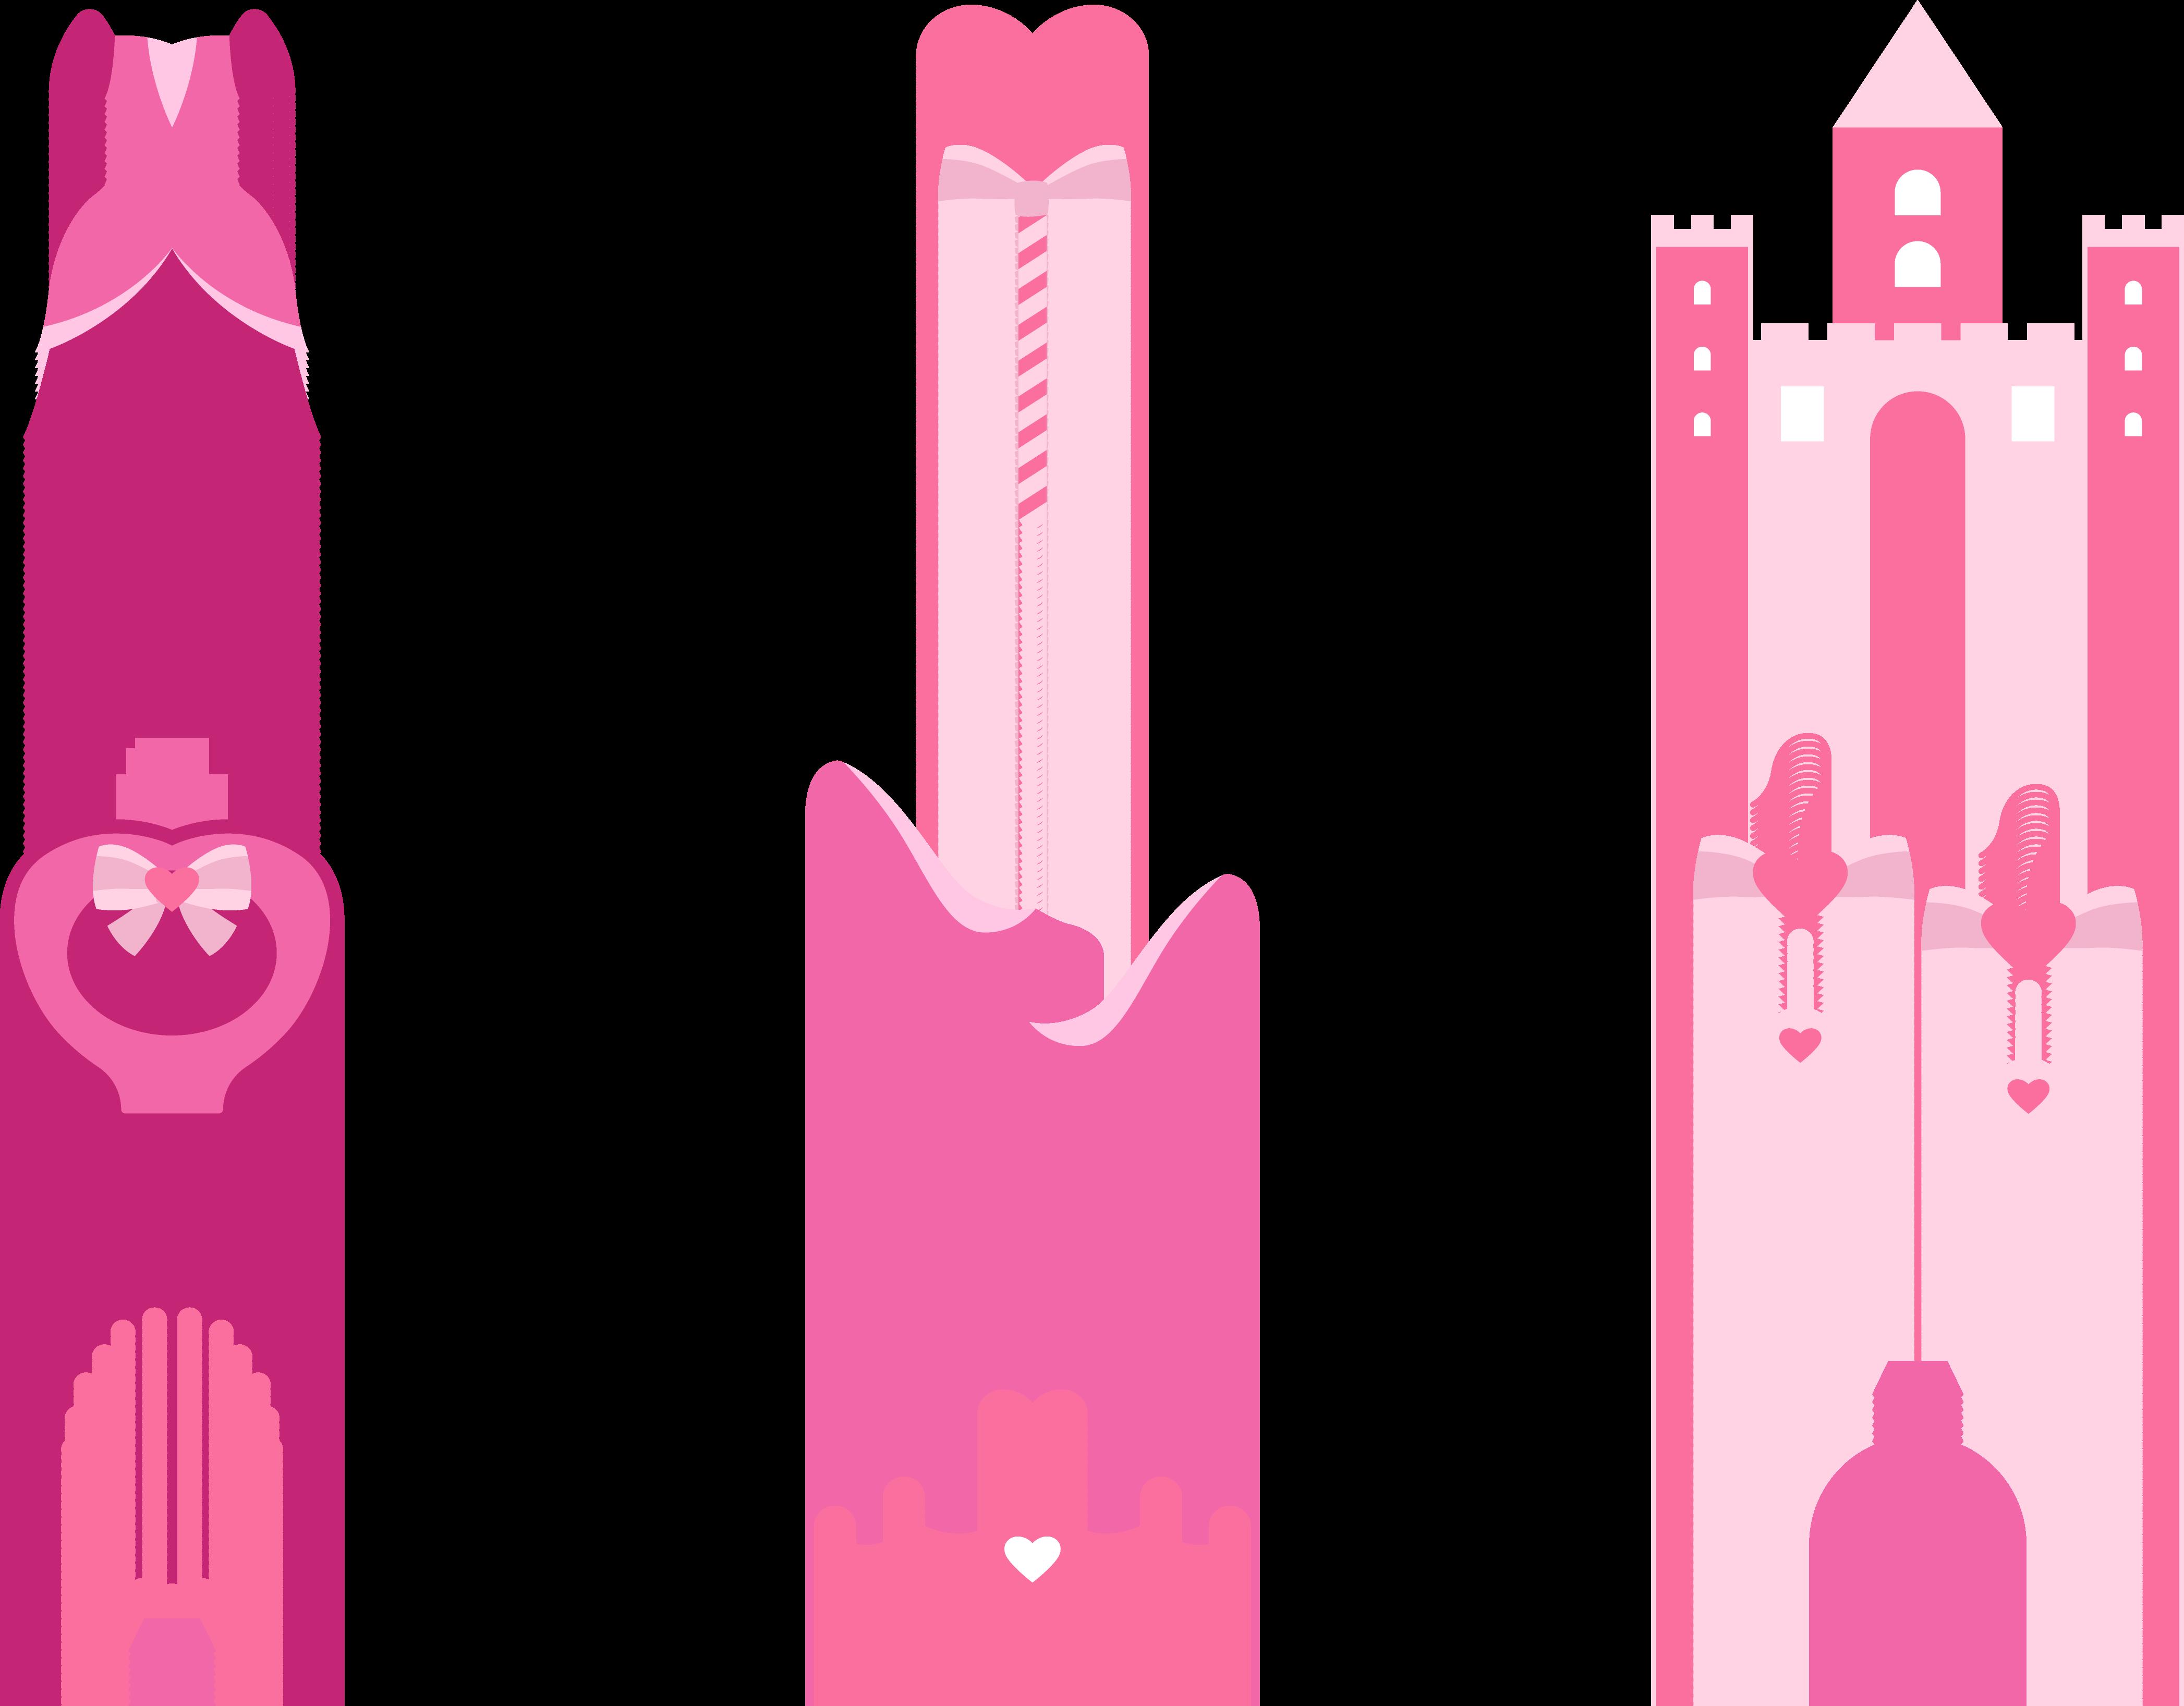 Fairy tale line clipart crown line freeuse download Princess Cartoon Illustration - Magic crown cute fantasy illustrator ... freeuse download